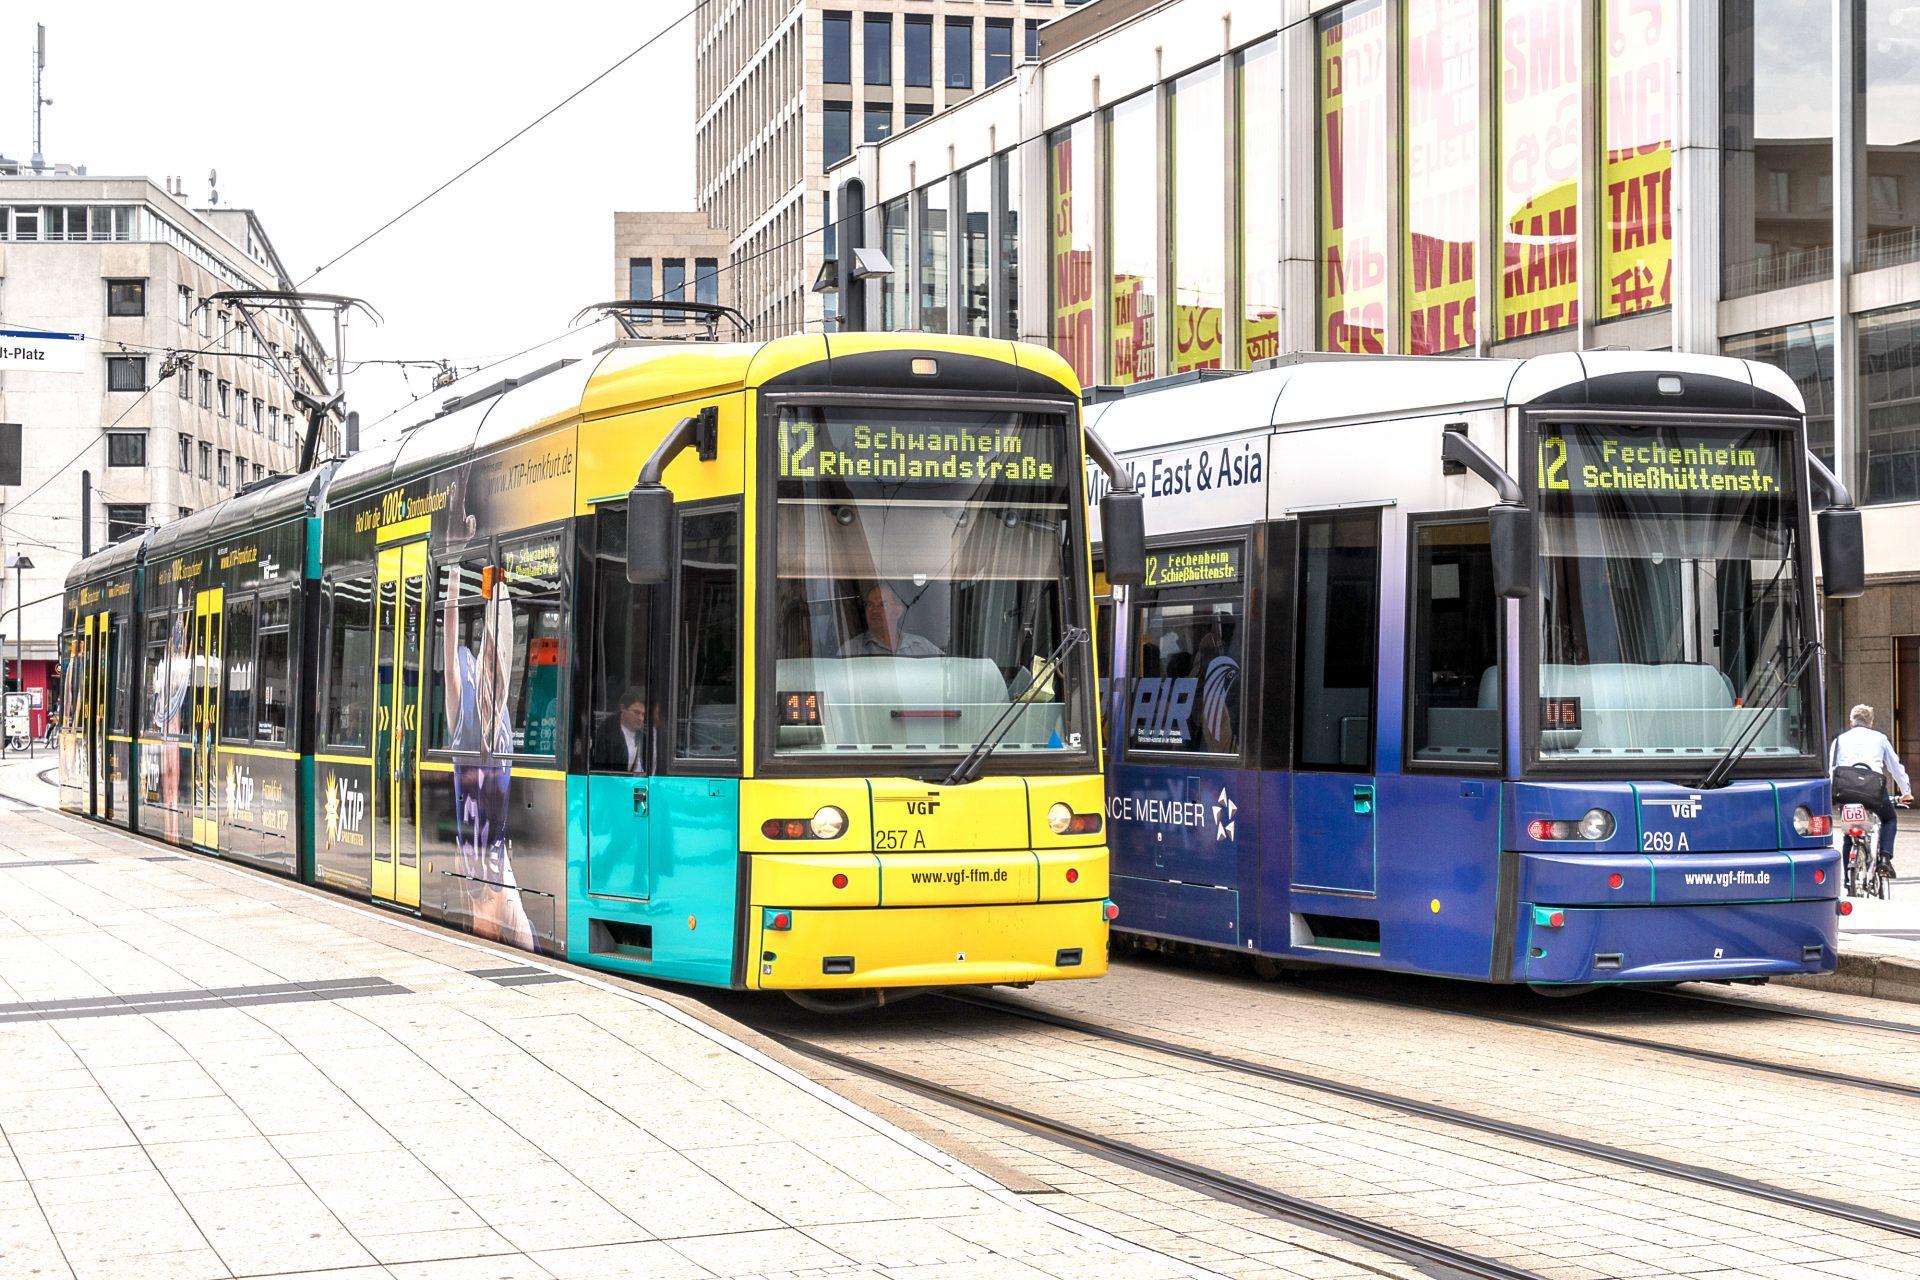 Frankfurter Straßenbahn am Willy-Brandt-Platz